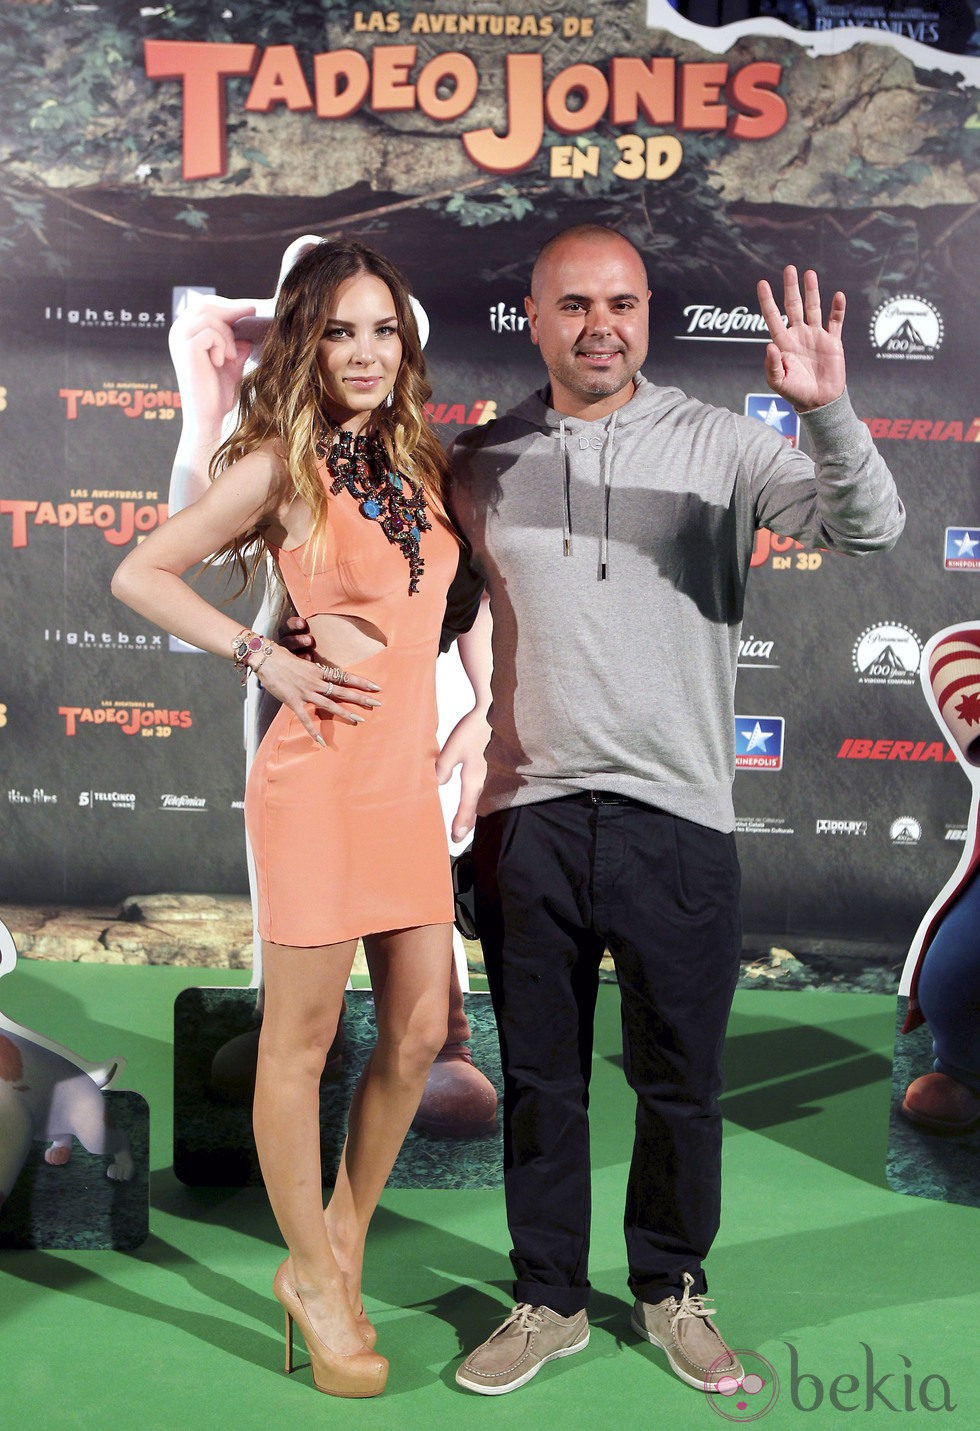 ¿Cuánto mide Juan Magán? - Altura 26982_magan-belinda-estreno-aventuras-tadeo